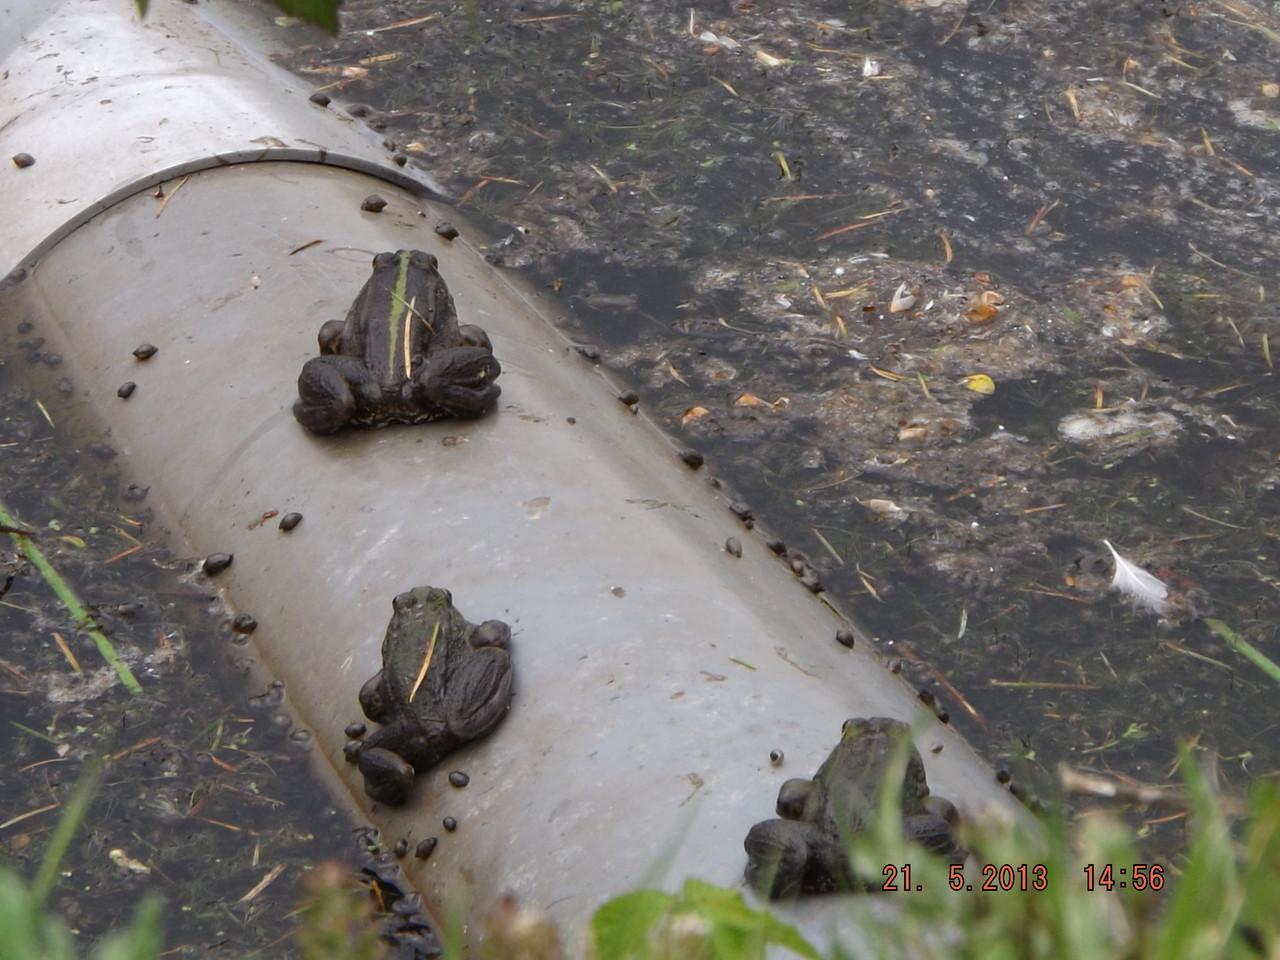 Trois grenouilles !!!!!!